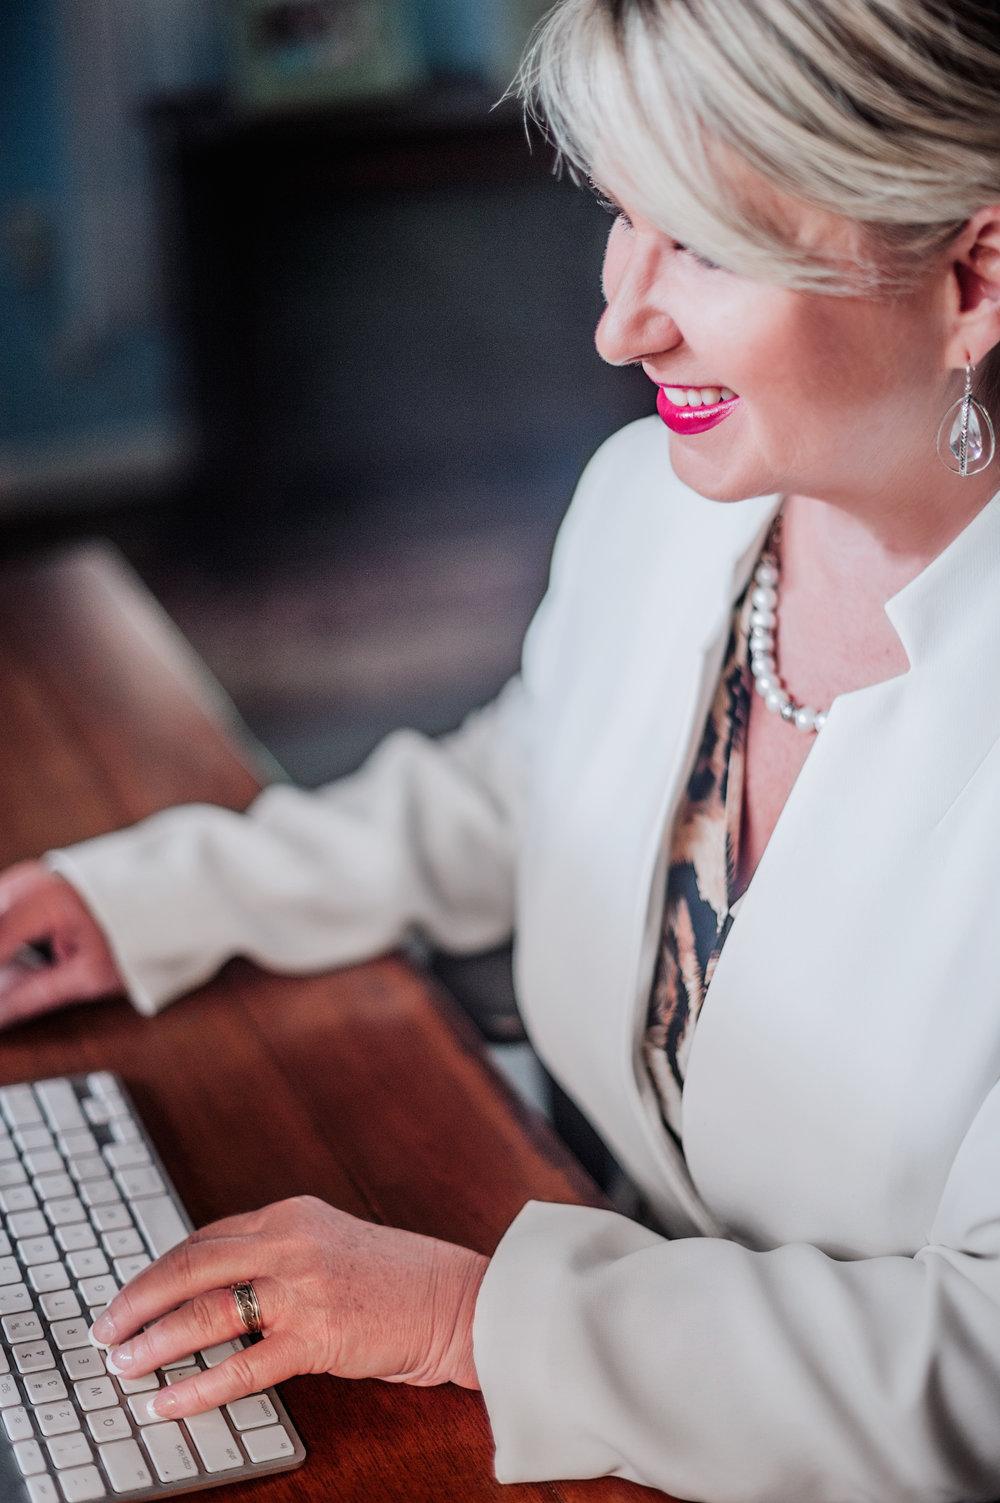 Jacqui, Resume Writer at careertrend.net